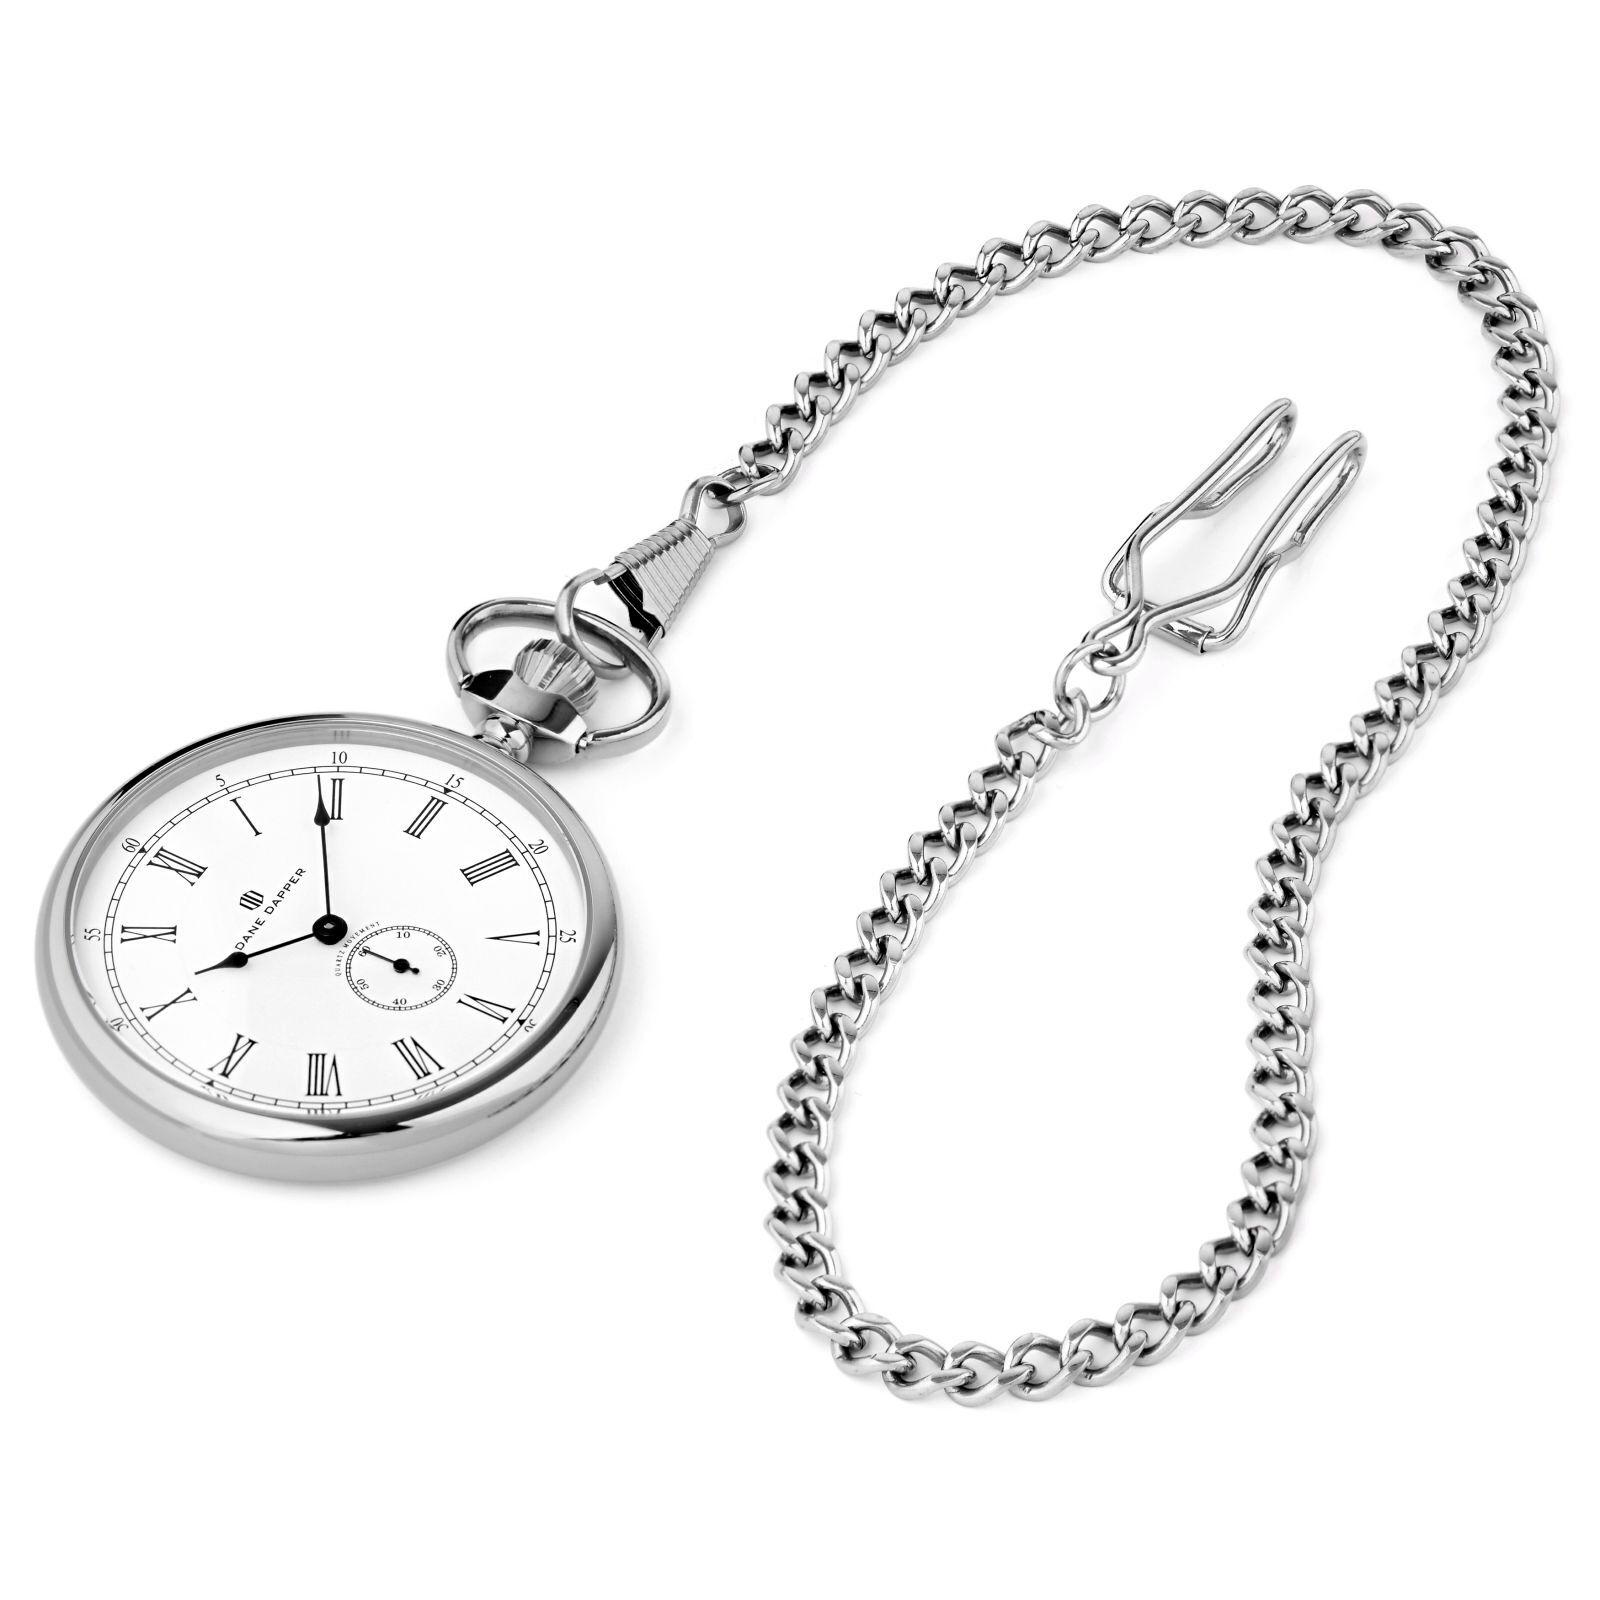 Dane Dapper Hopeanvärinen & valkoinen Time Keeper -taskukello